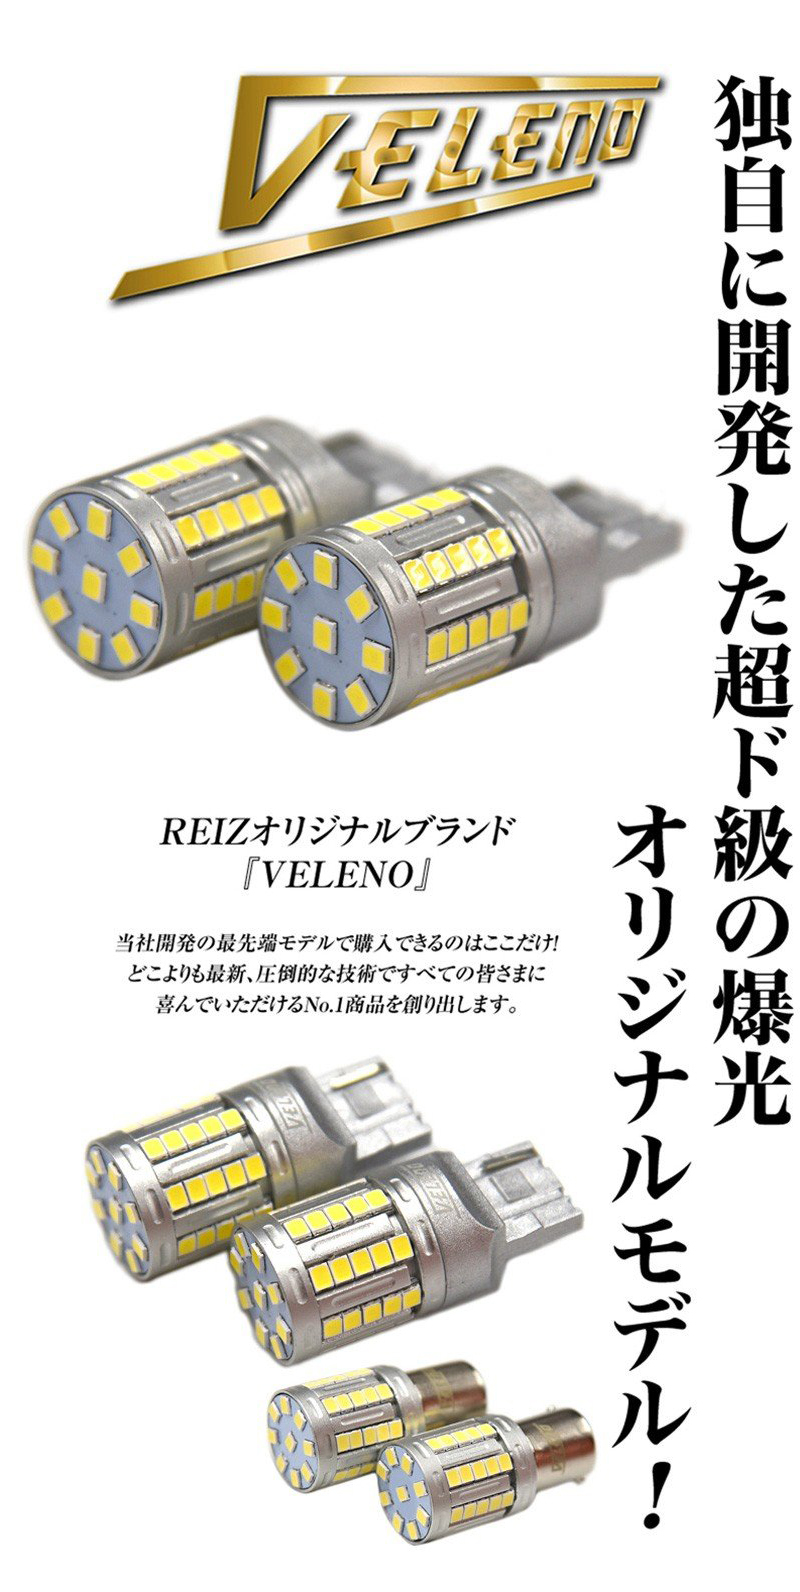 T20,LED,バックランプ,実測値8000lm,VELENO,ヘッドライト超,爆光,純正同様配光,無極性,ハイブリッド車対応,2球,車検対応,白,ホワイト,1年保証,送料無料